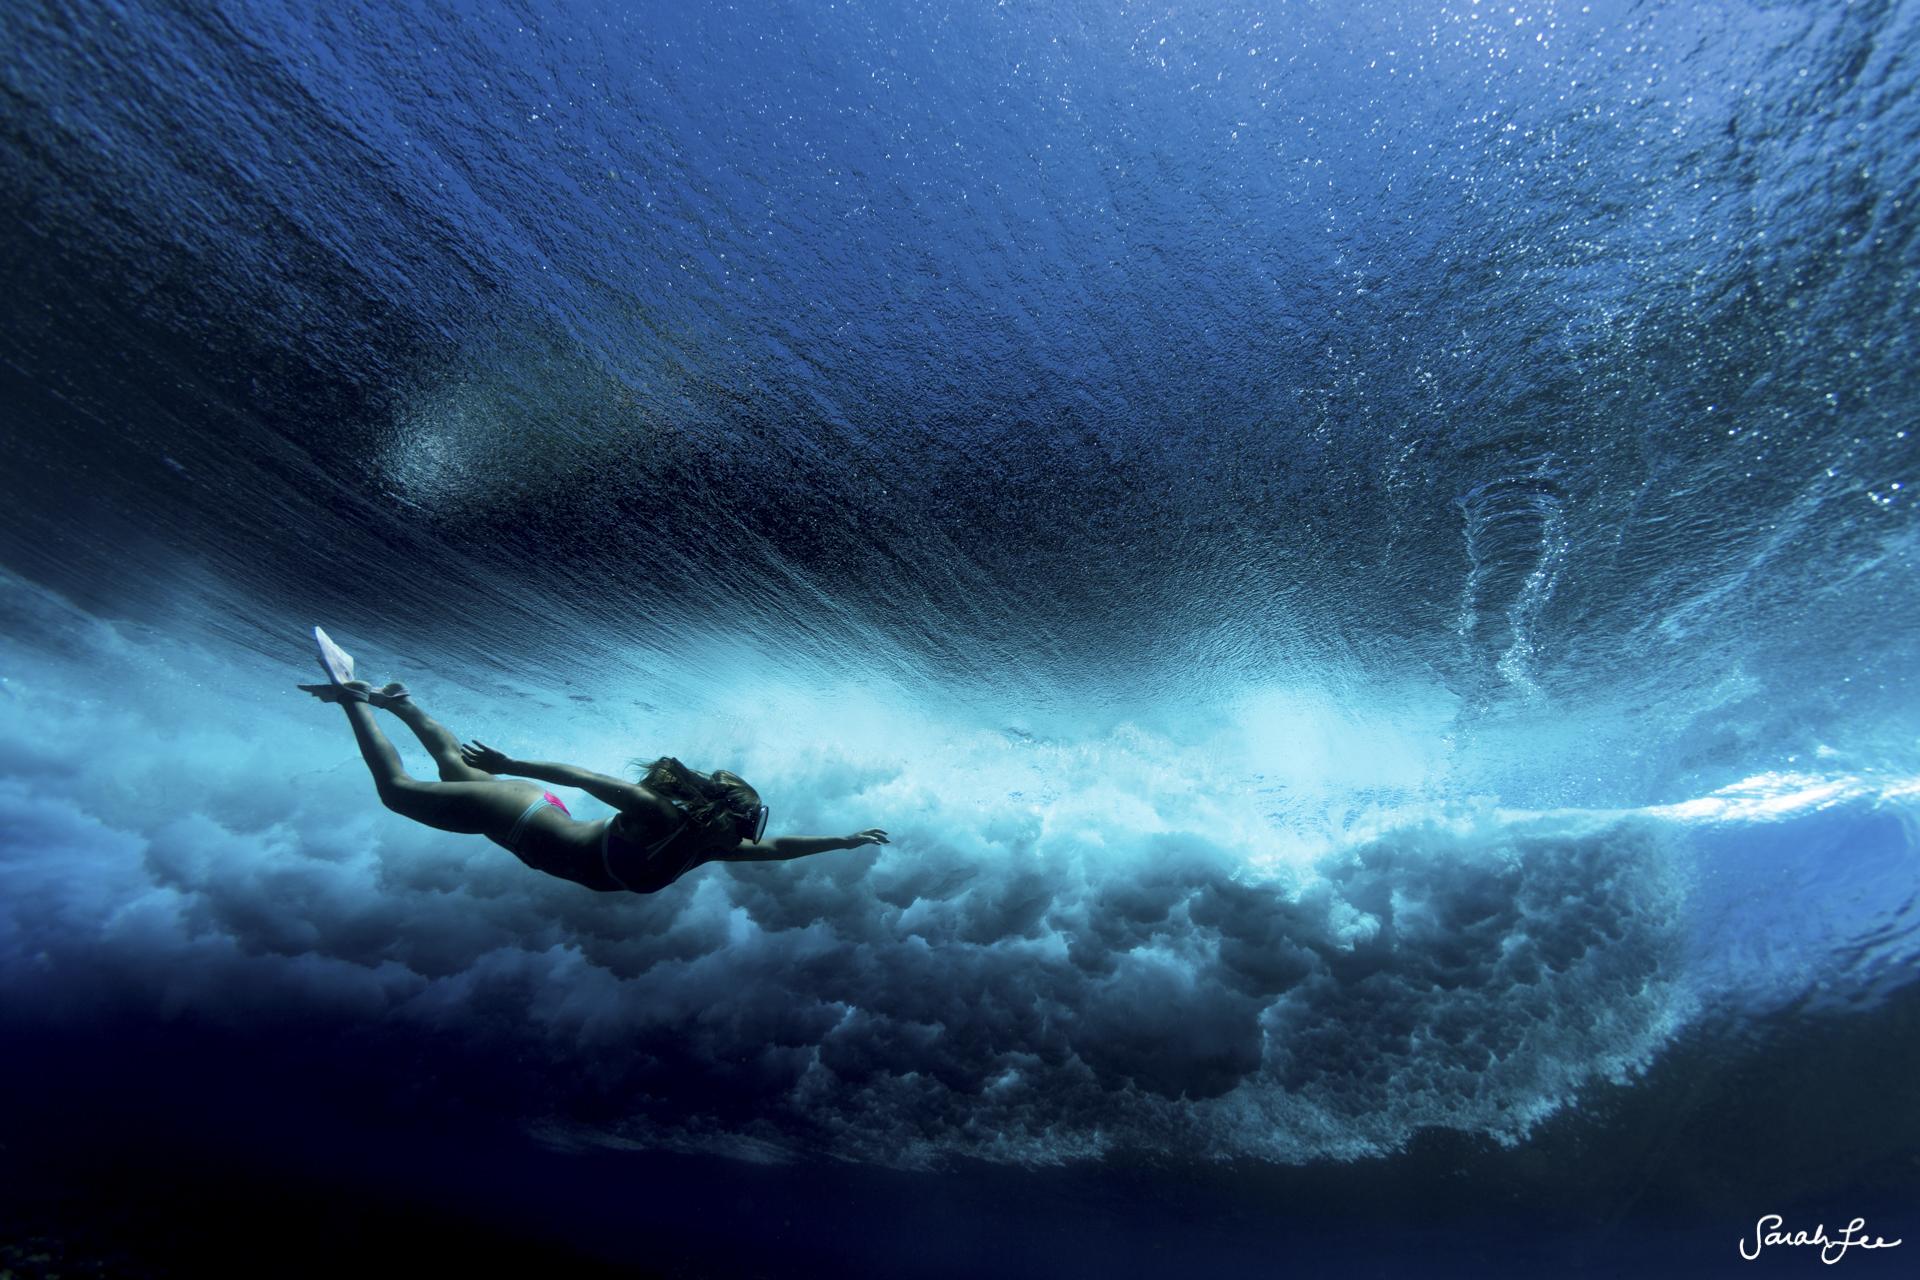 035_Sarah_Lee_Photography_Underwater_3527.jpg